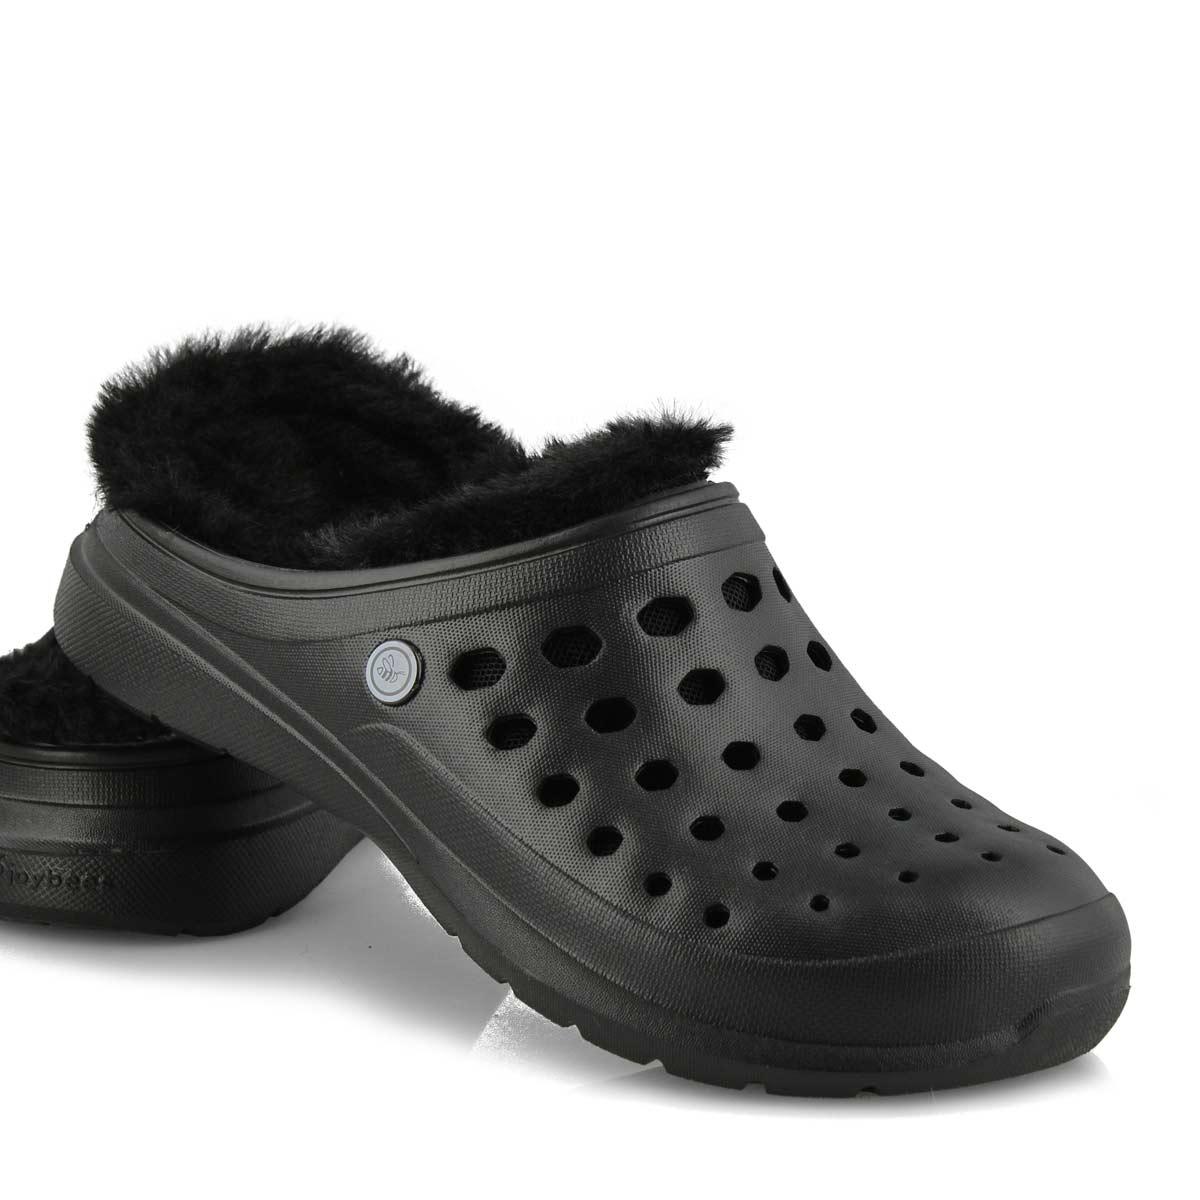 Unisex Uaslp Comfort Clog - Black/Black